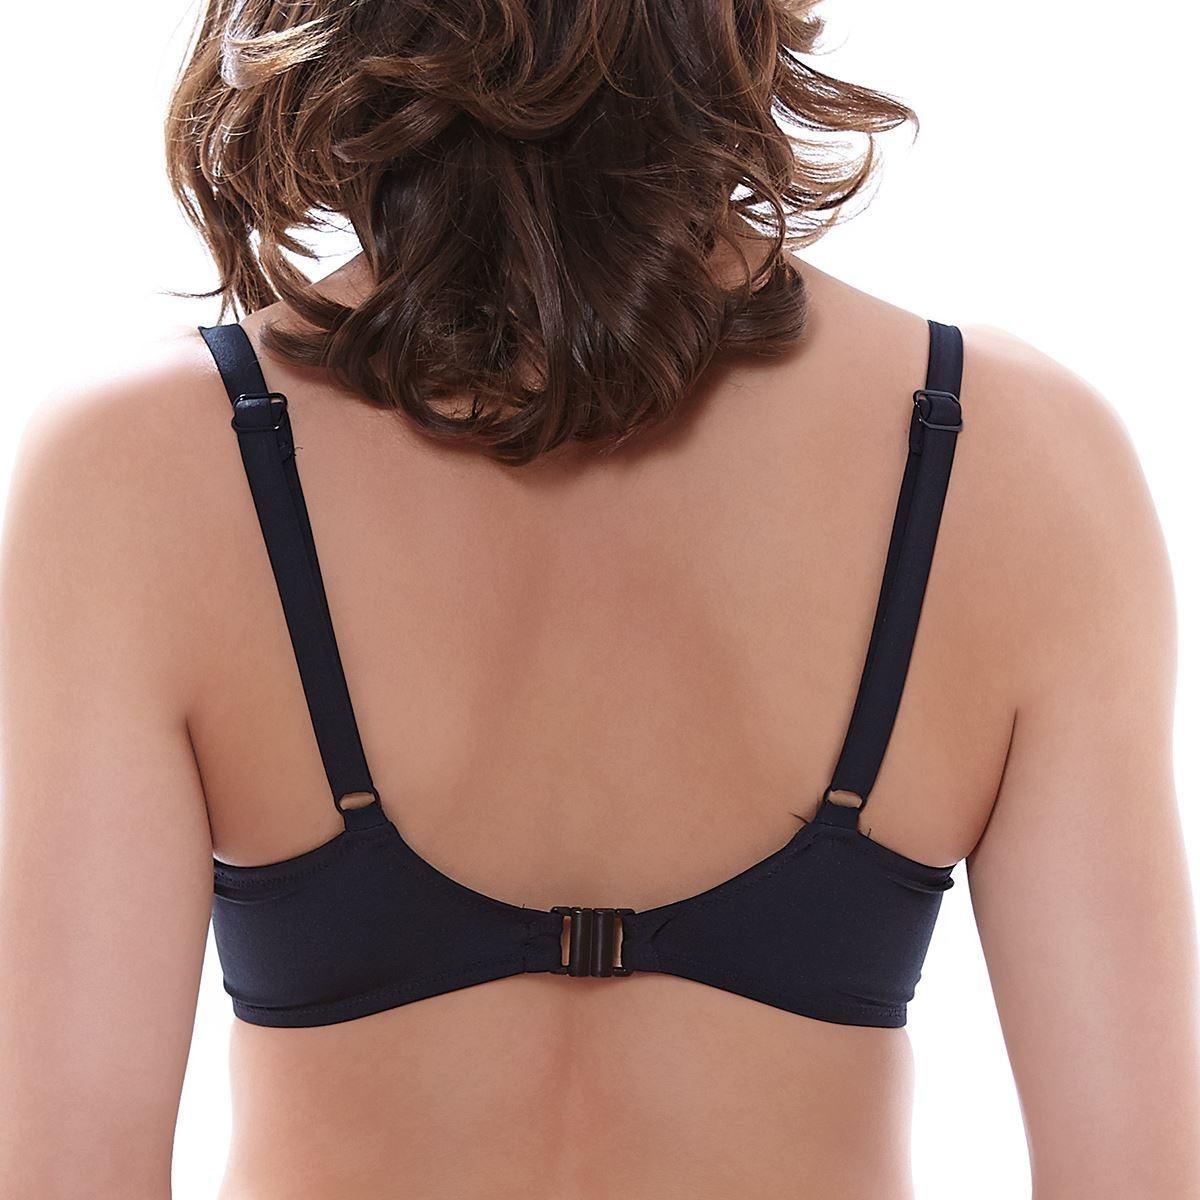 Fantasie-Swimwear-Los-Cabos-Twist-Front-Full-Cup-Bikini-Top-6152